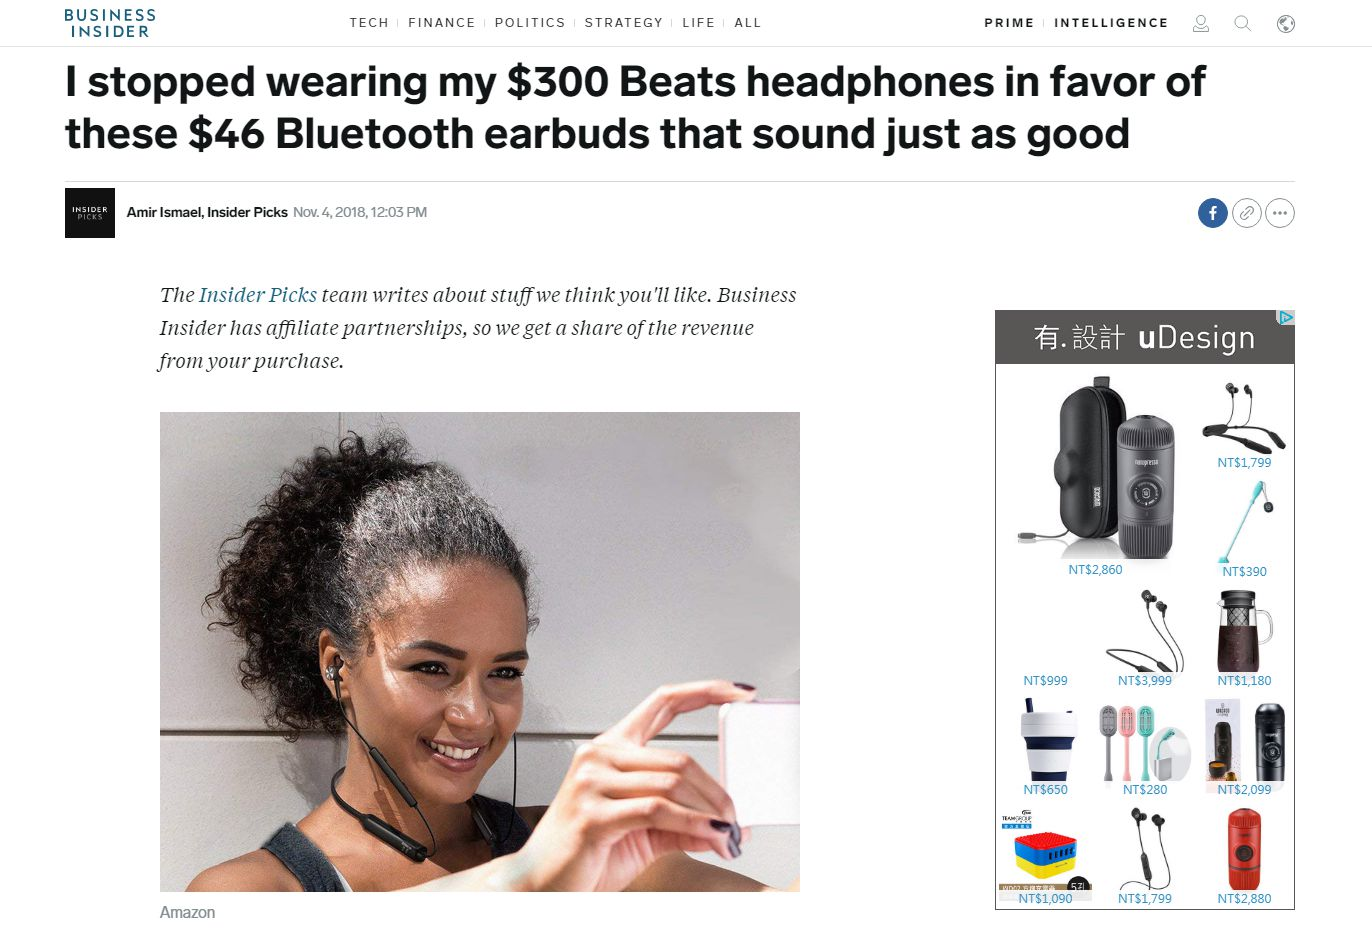 TaoTronics TT-BH042頸掛式降噪藍牙耳機 - Business Insider音評